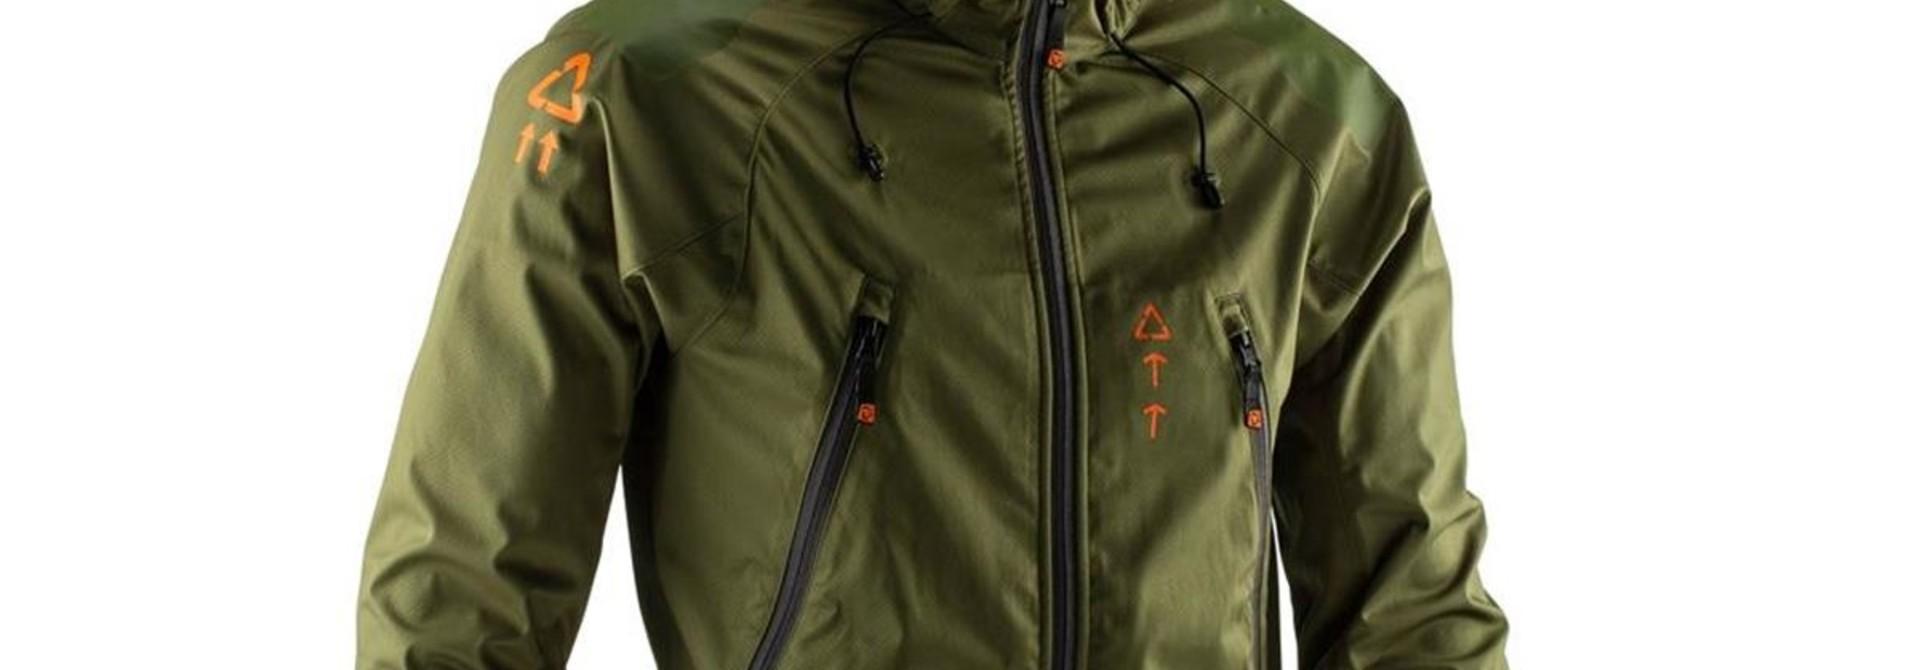 Leatt DBX 4.0 Jacket